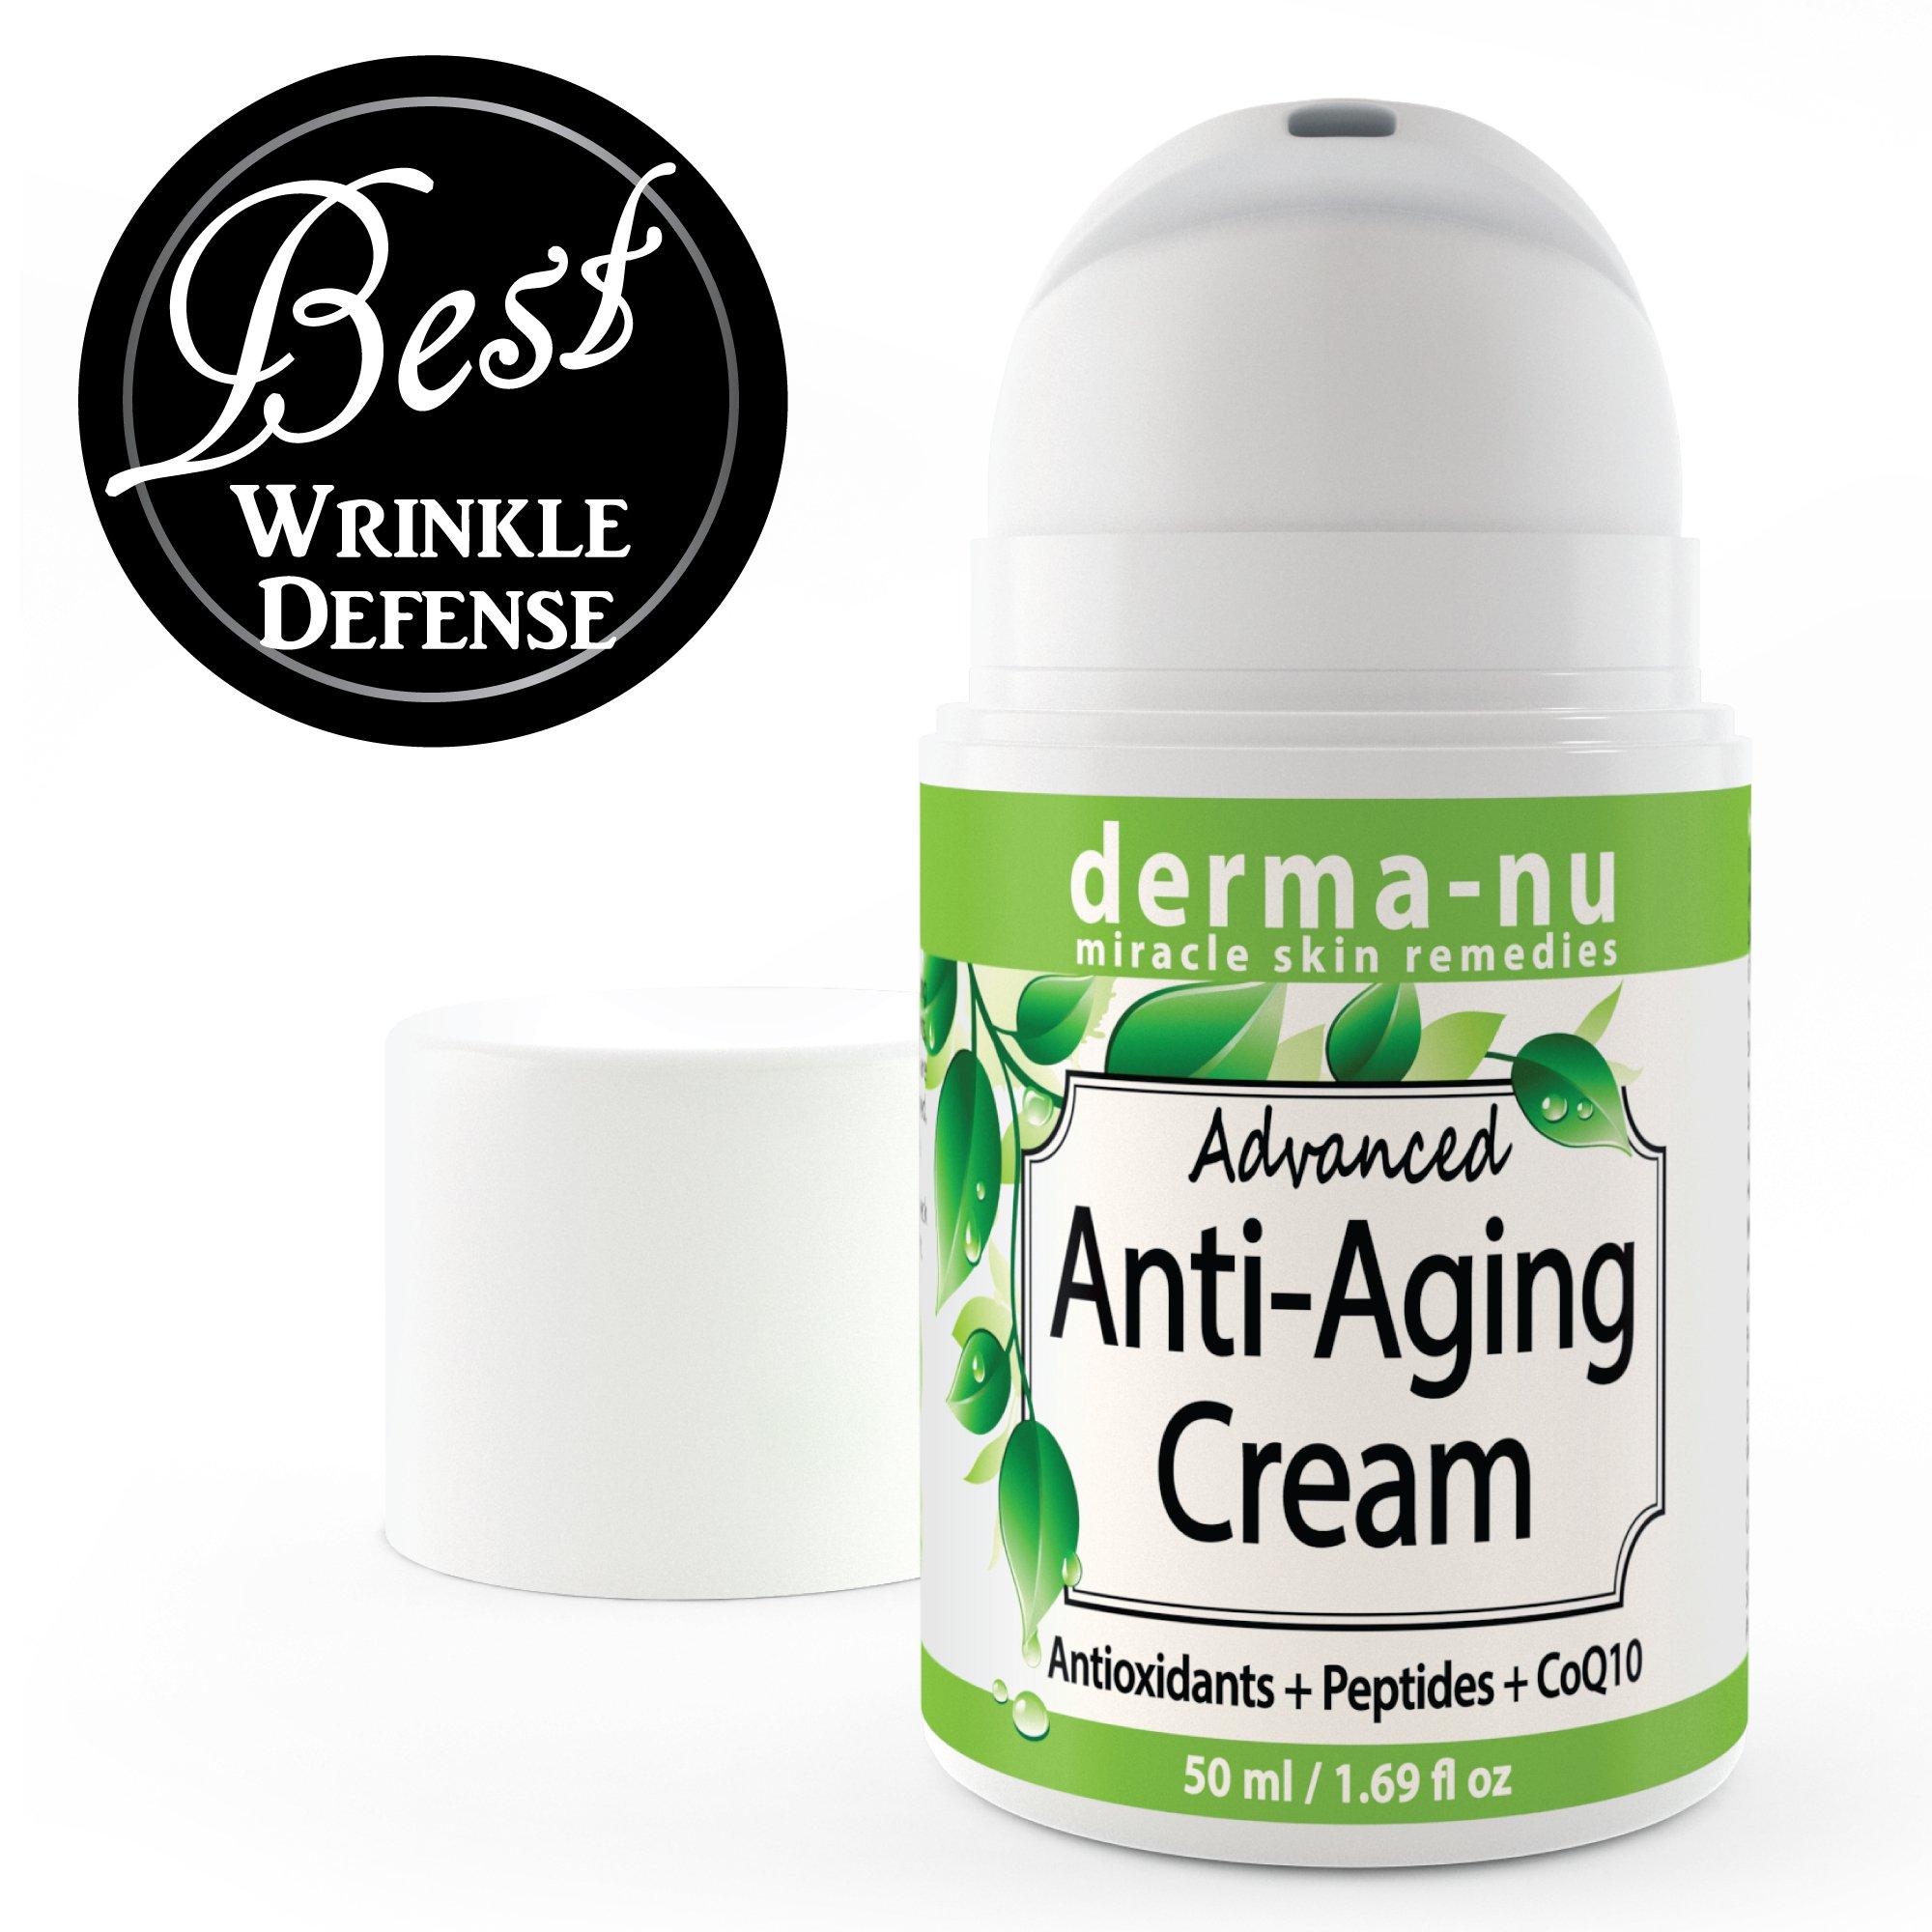 aloe vera dry skin cream best remedy skin. Black Bedroom Furniture Sets. Home Design Ideas